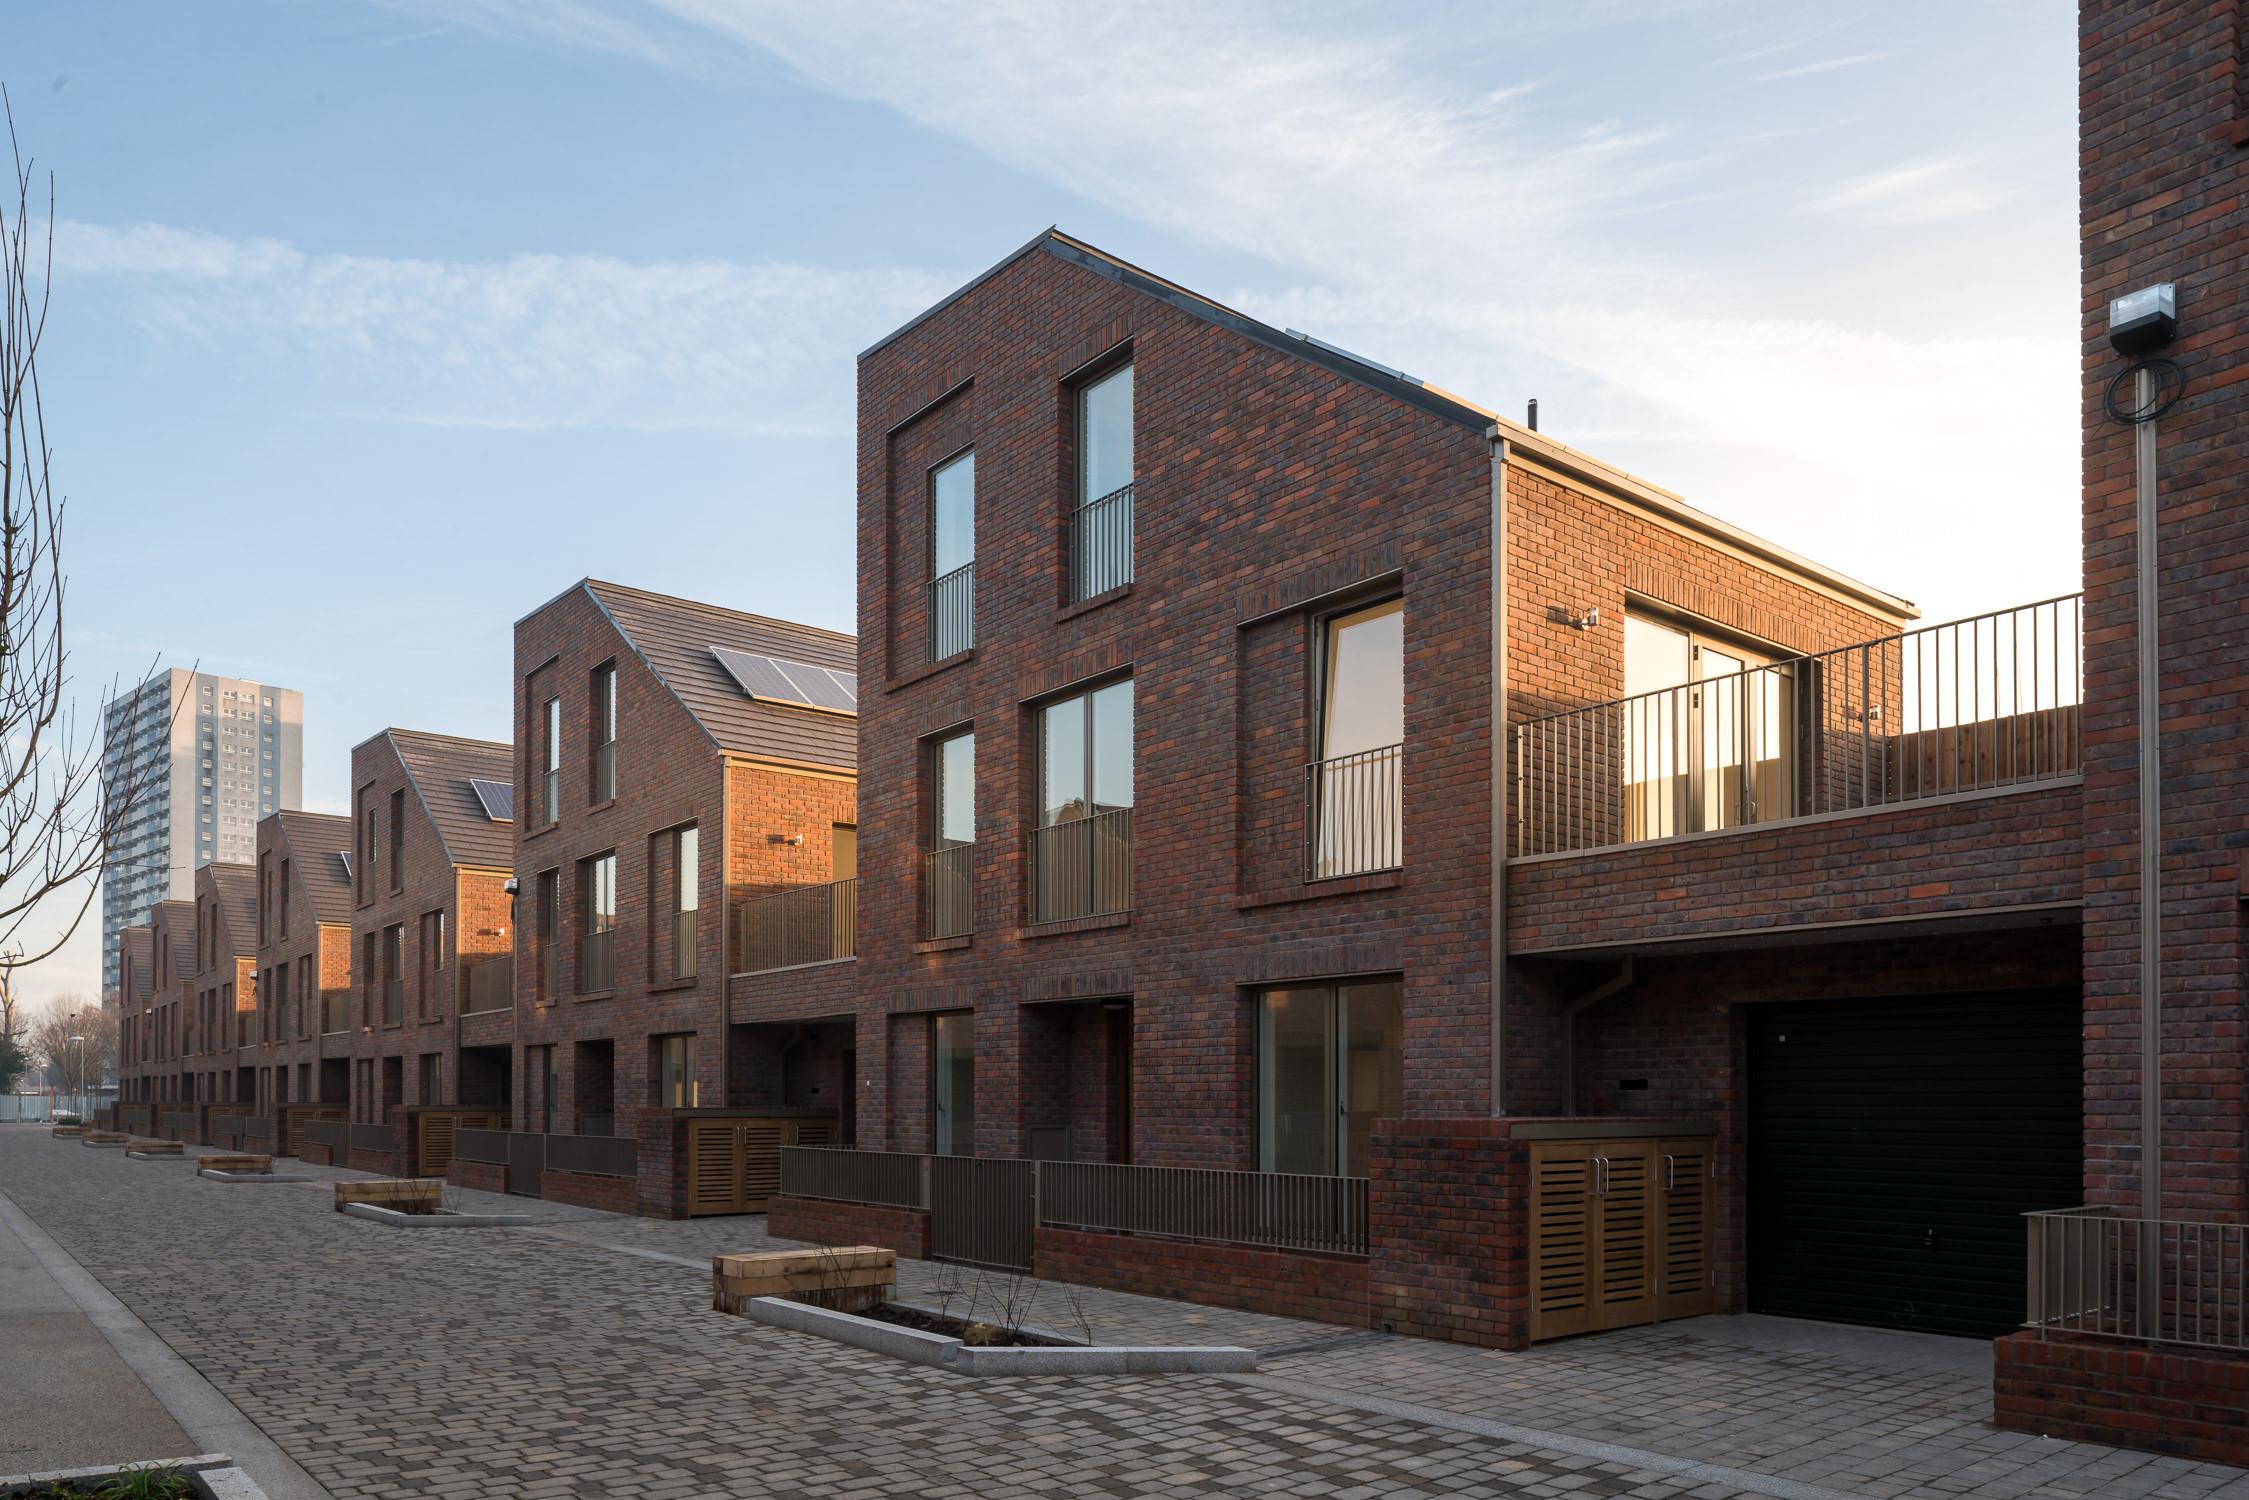 mark-hadden-architecture-photographer-architectuur-interieur-fotografie-london-amsterdam-Dujardin Mews-057.jpg